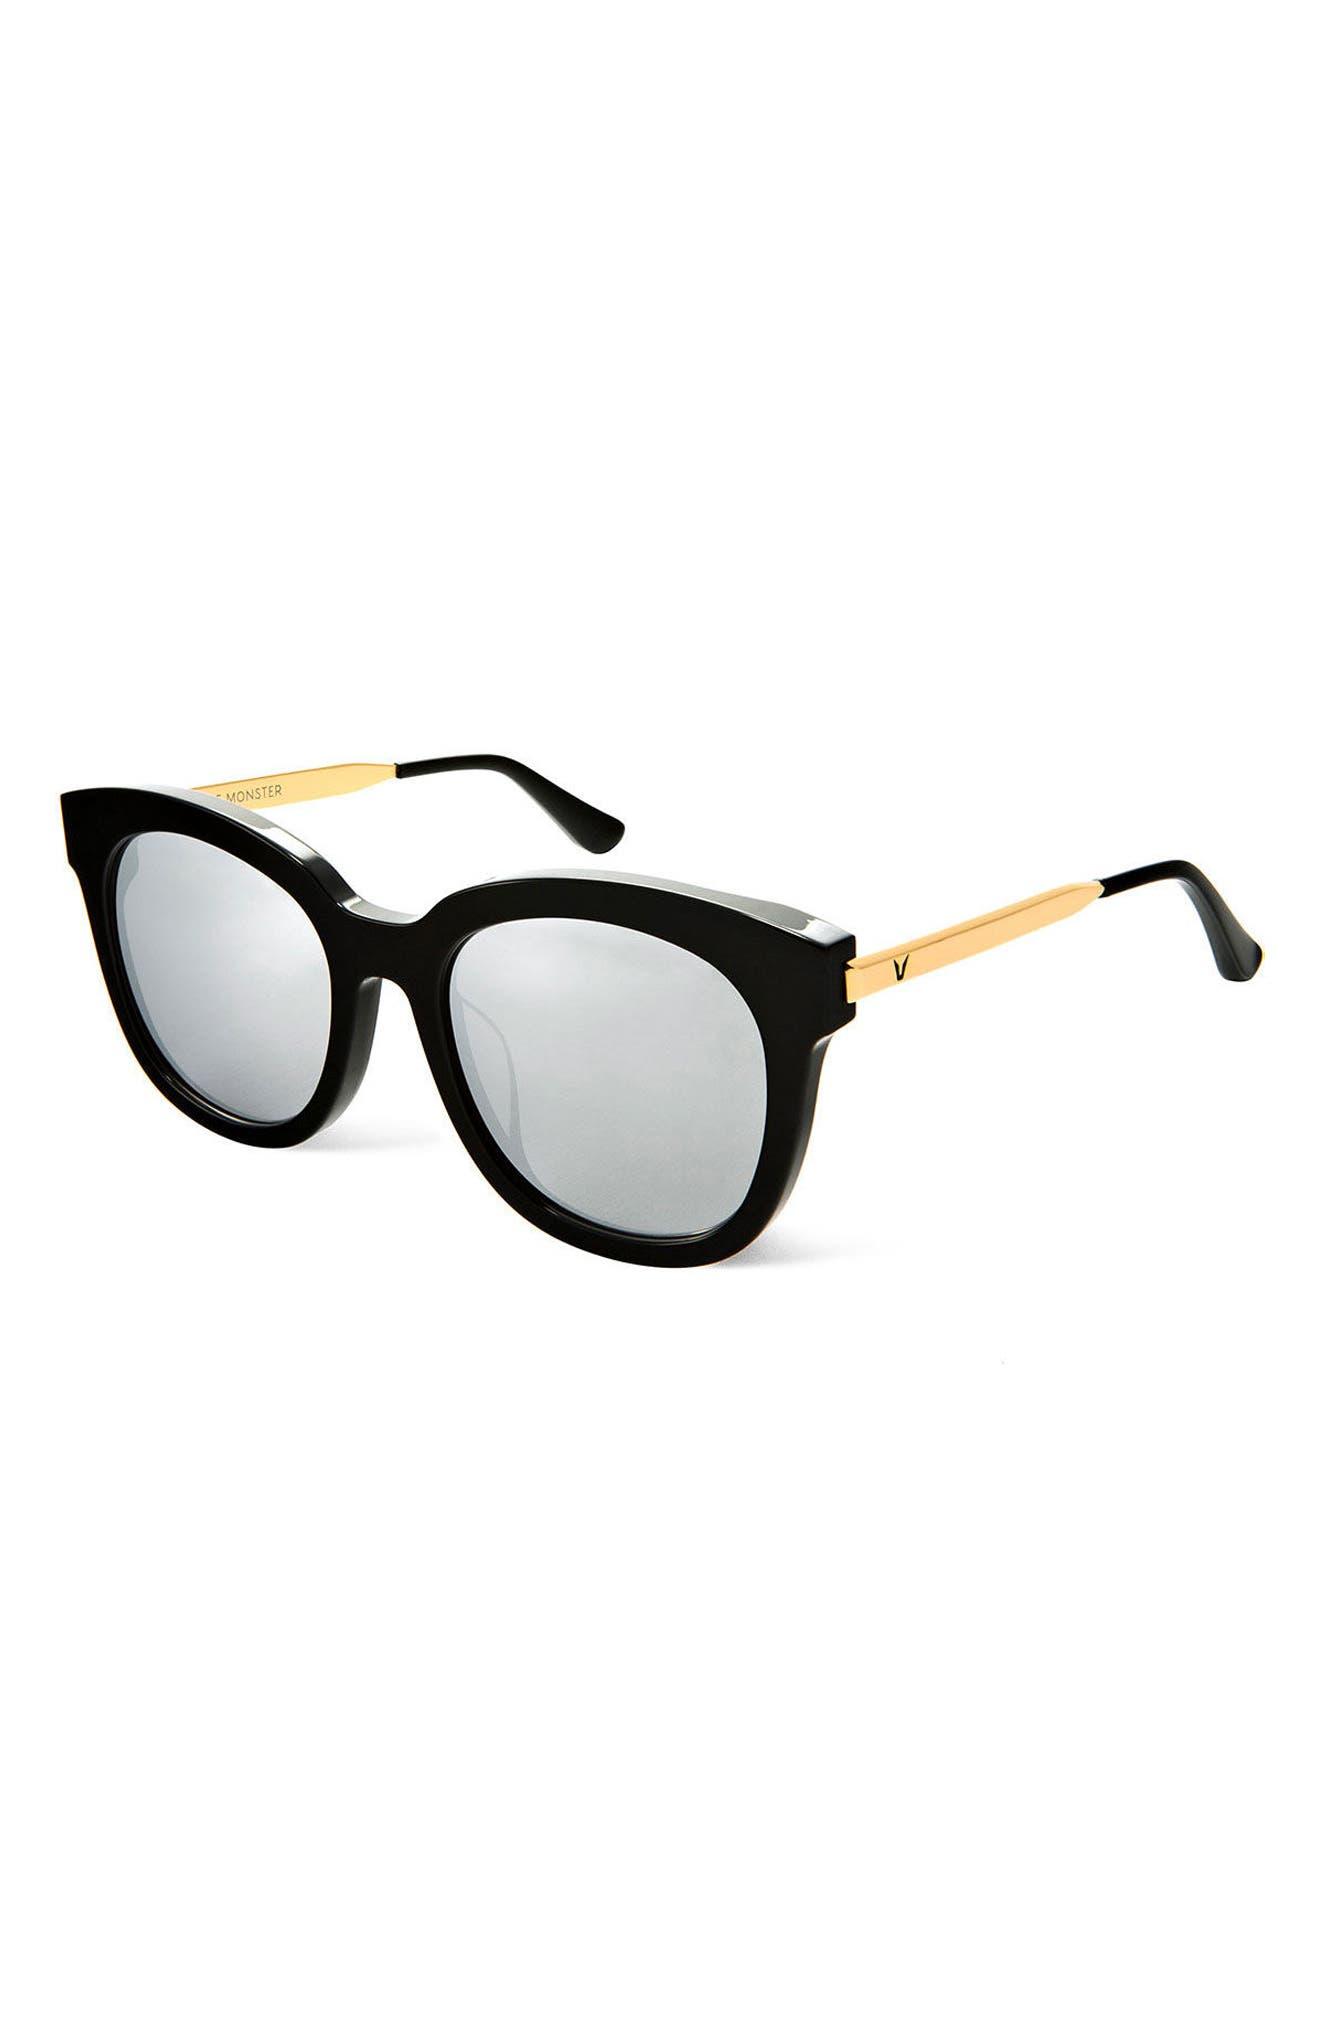 Cuba 55mm Sunglasses,                             Alternate thumbnail 2, color,                             Black/Silver